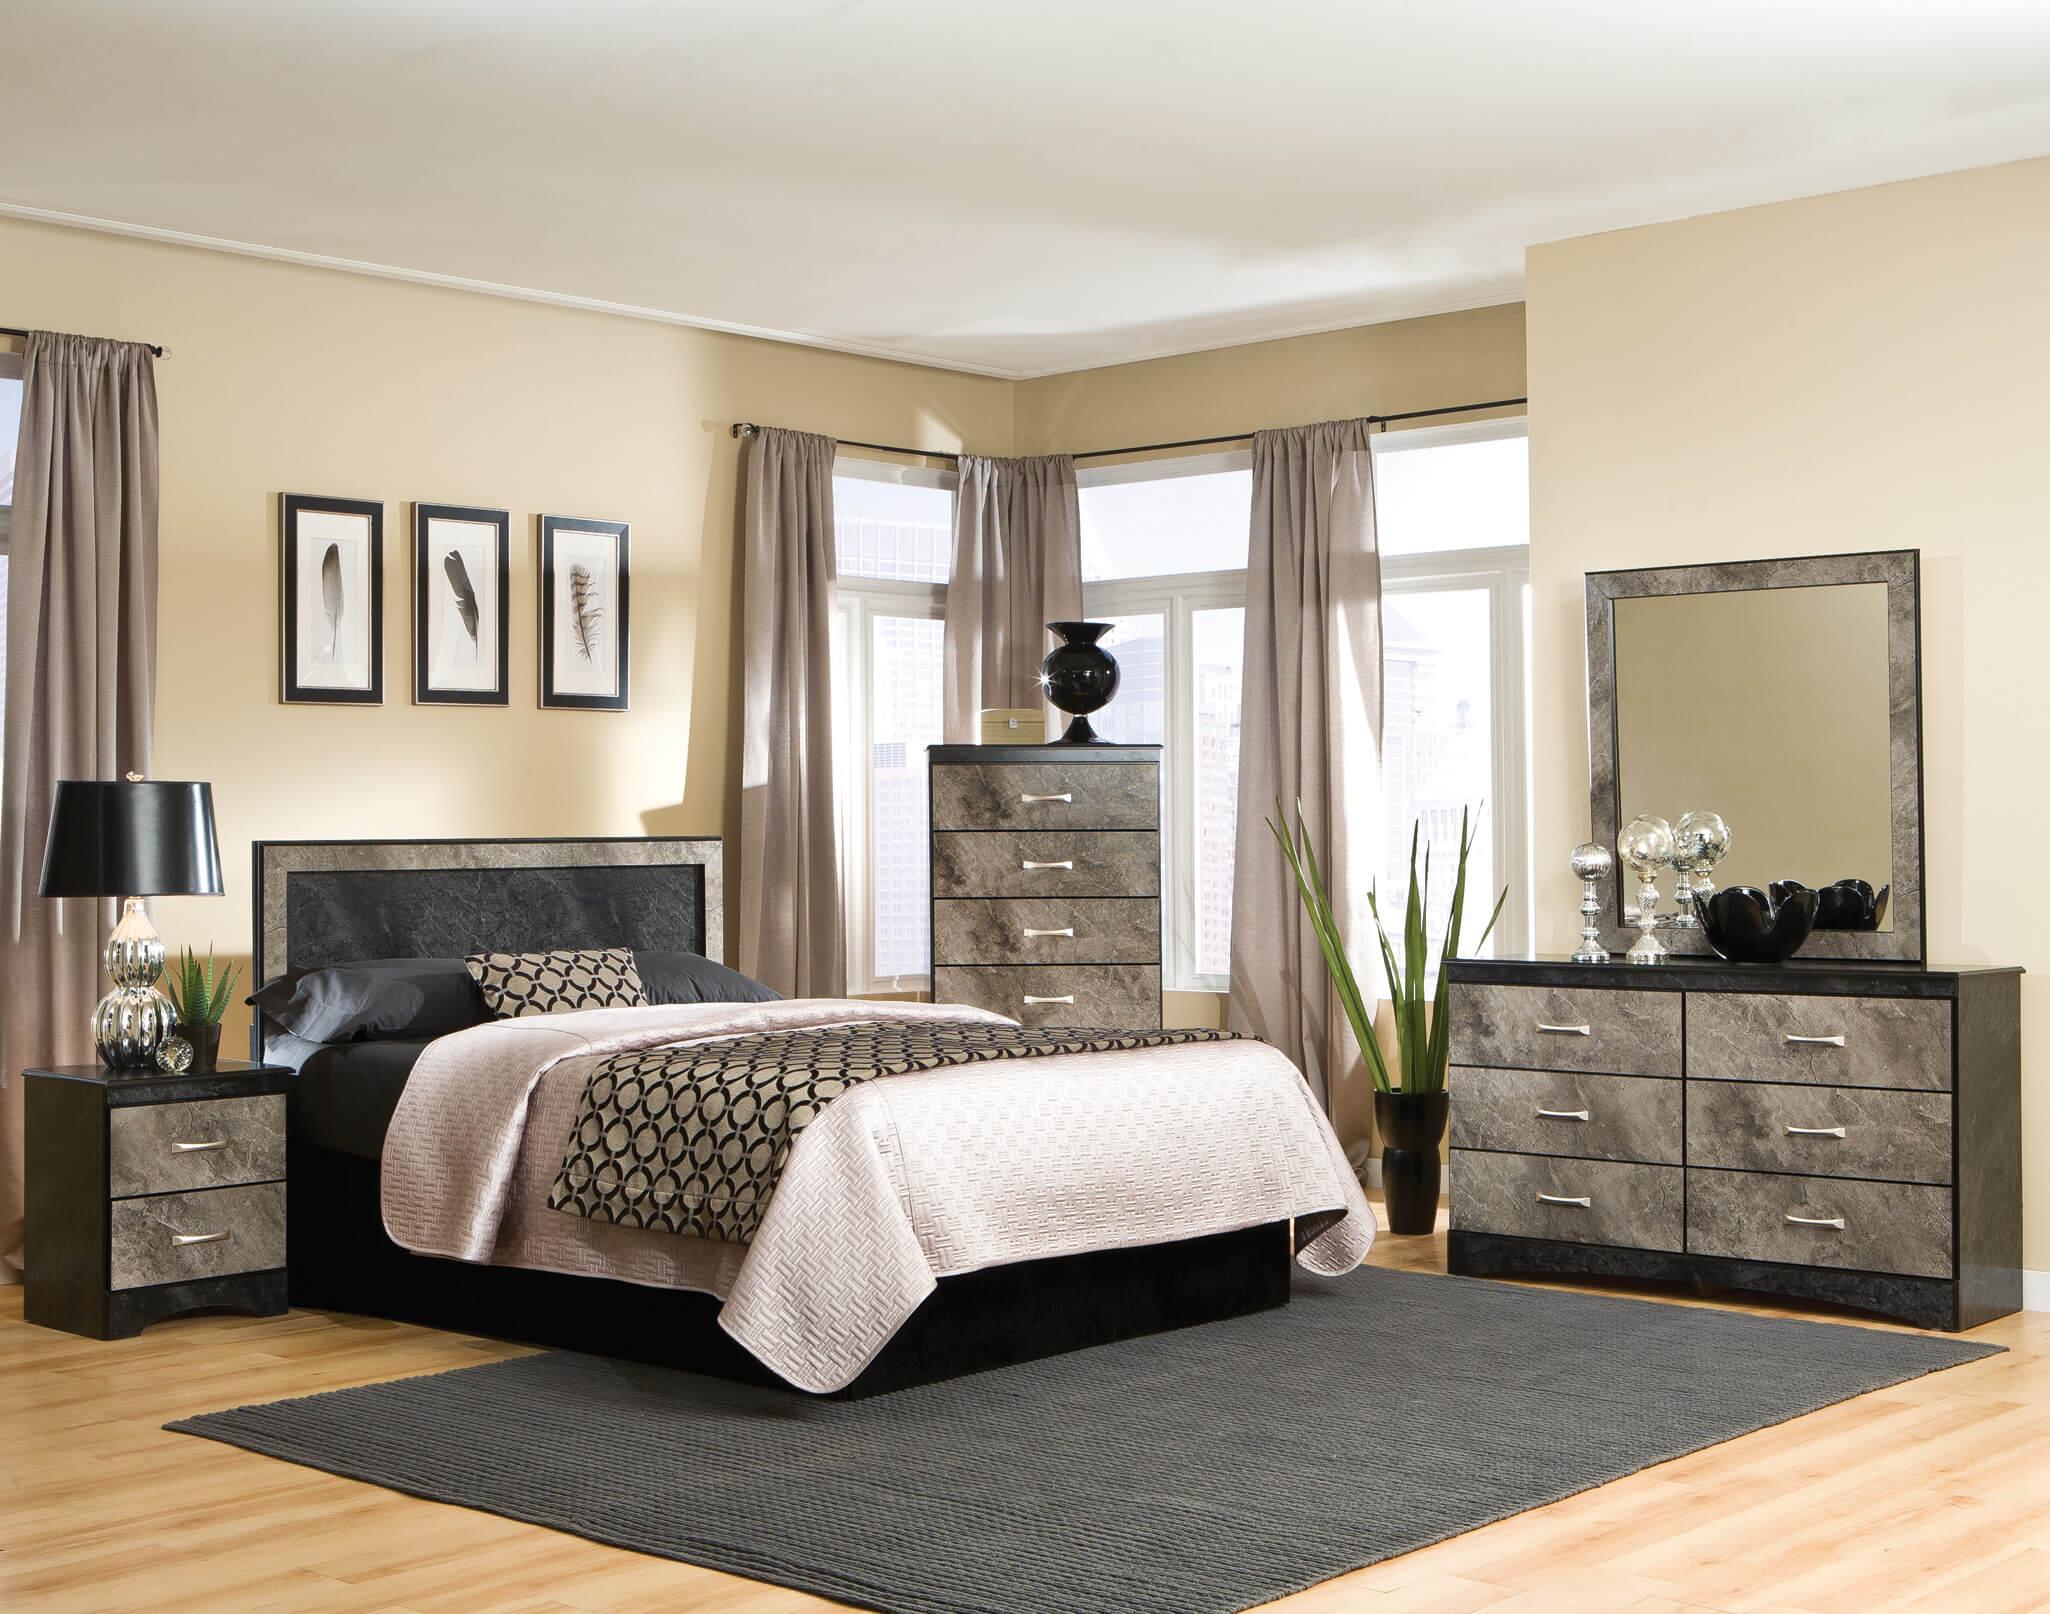 Image result for KITH FURNITURE BEDROOM SET MEMPHIS GREY